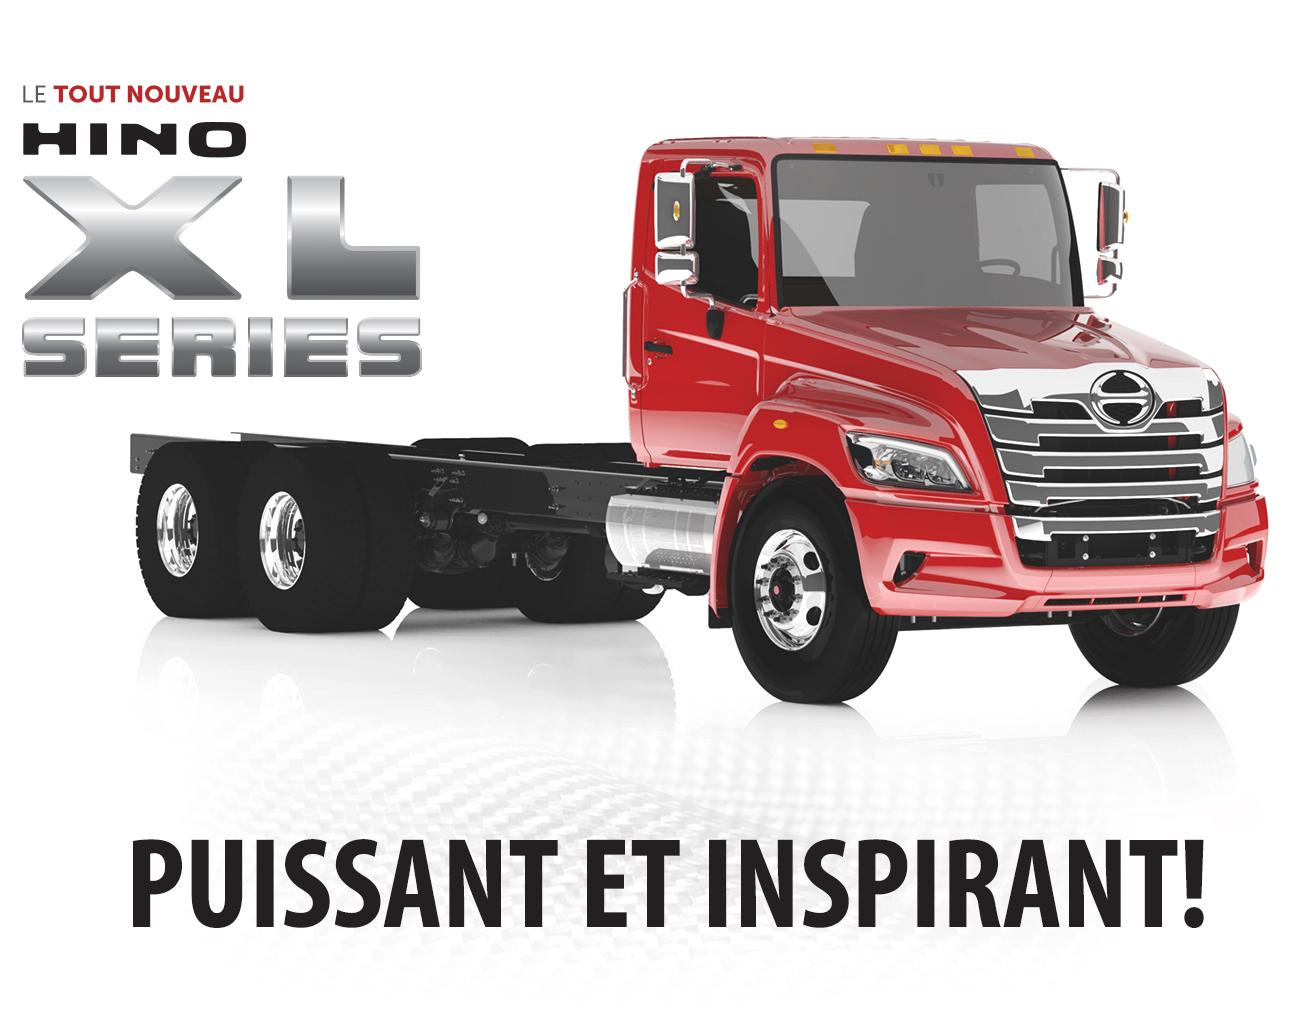 HINO XL-Series